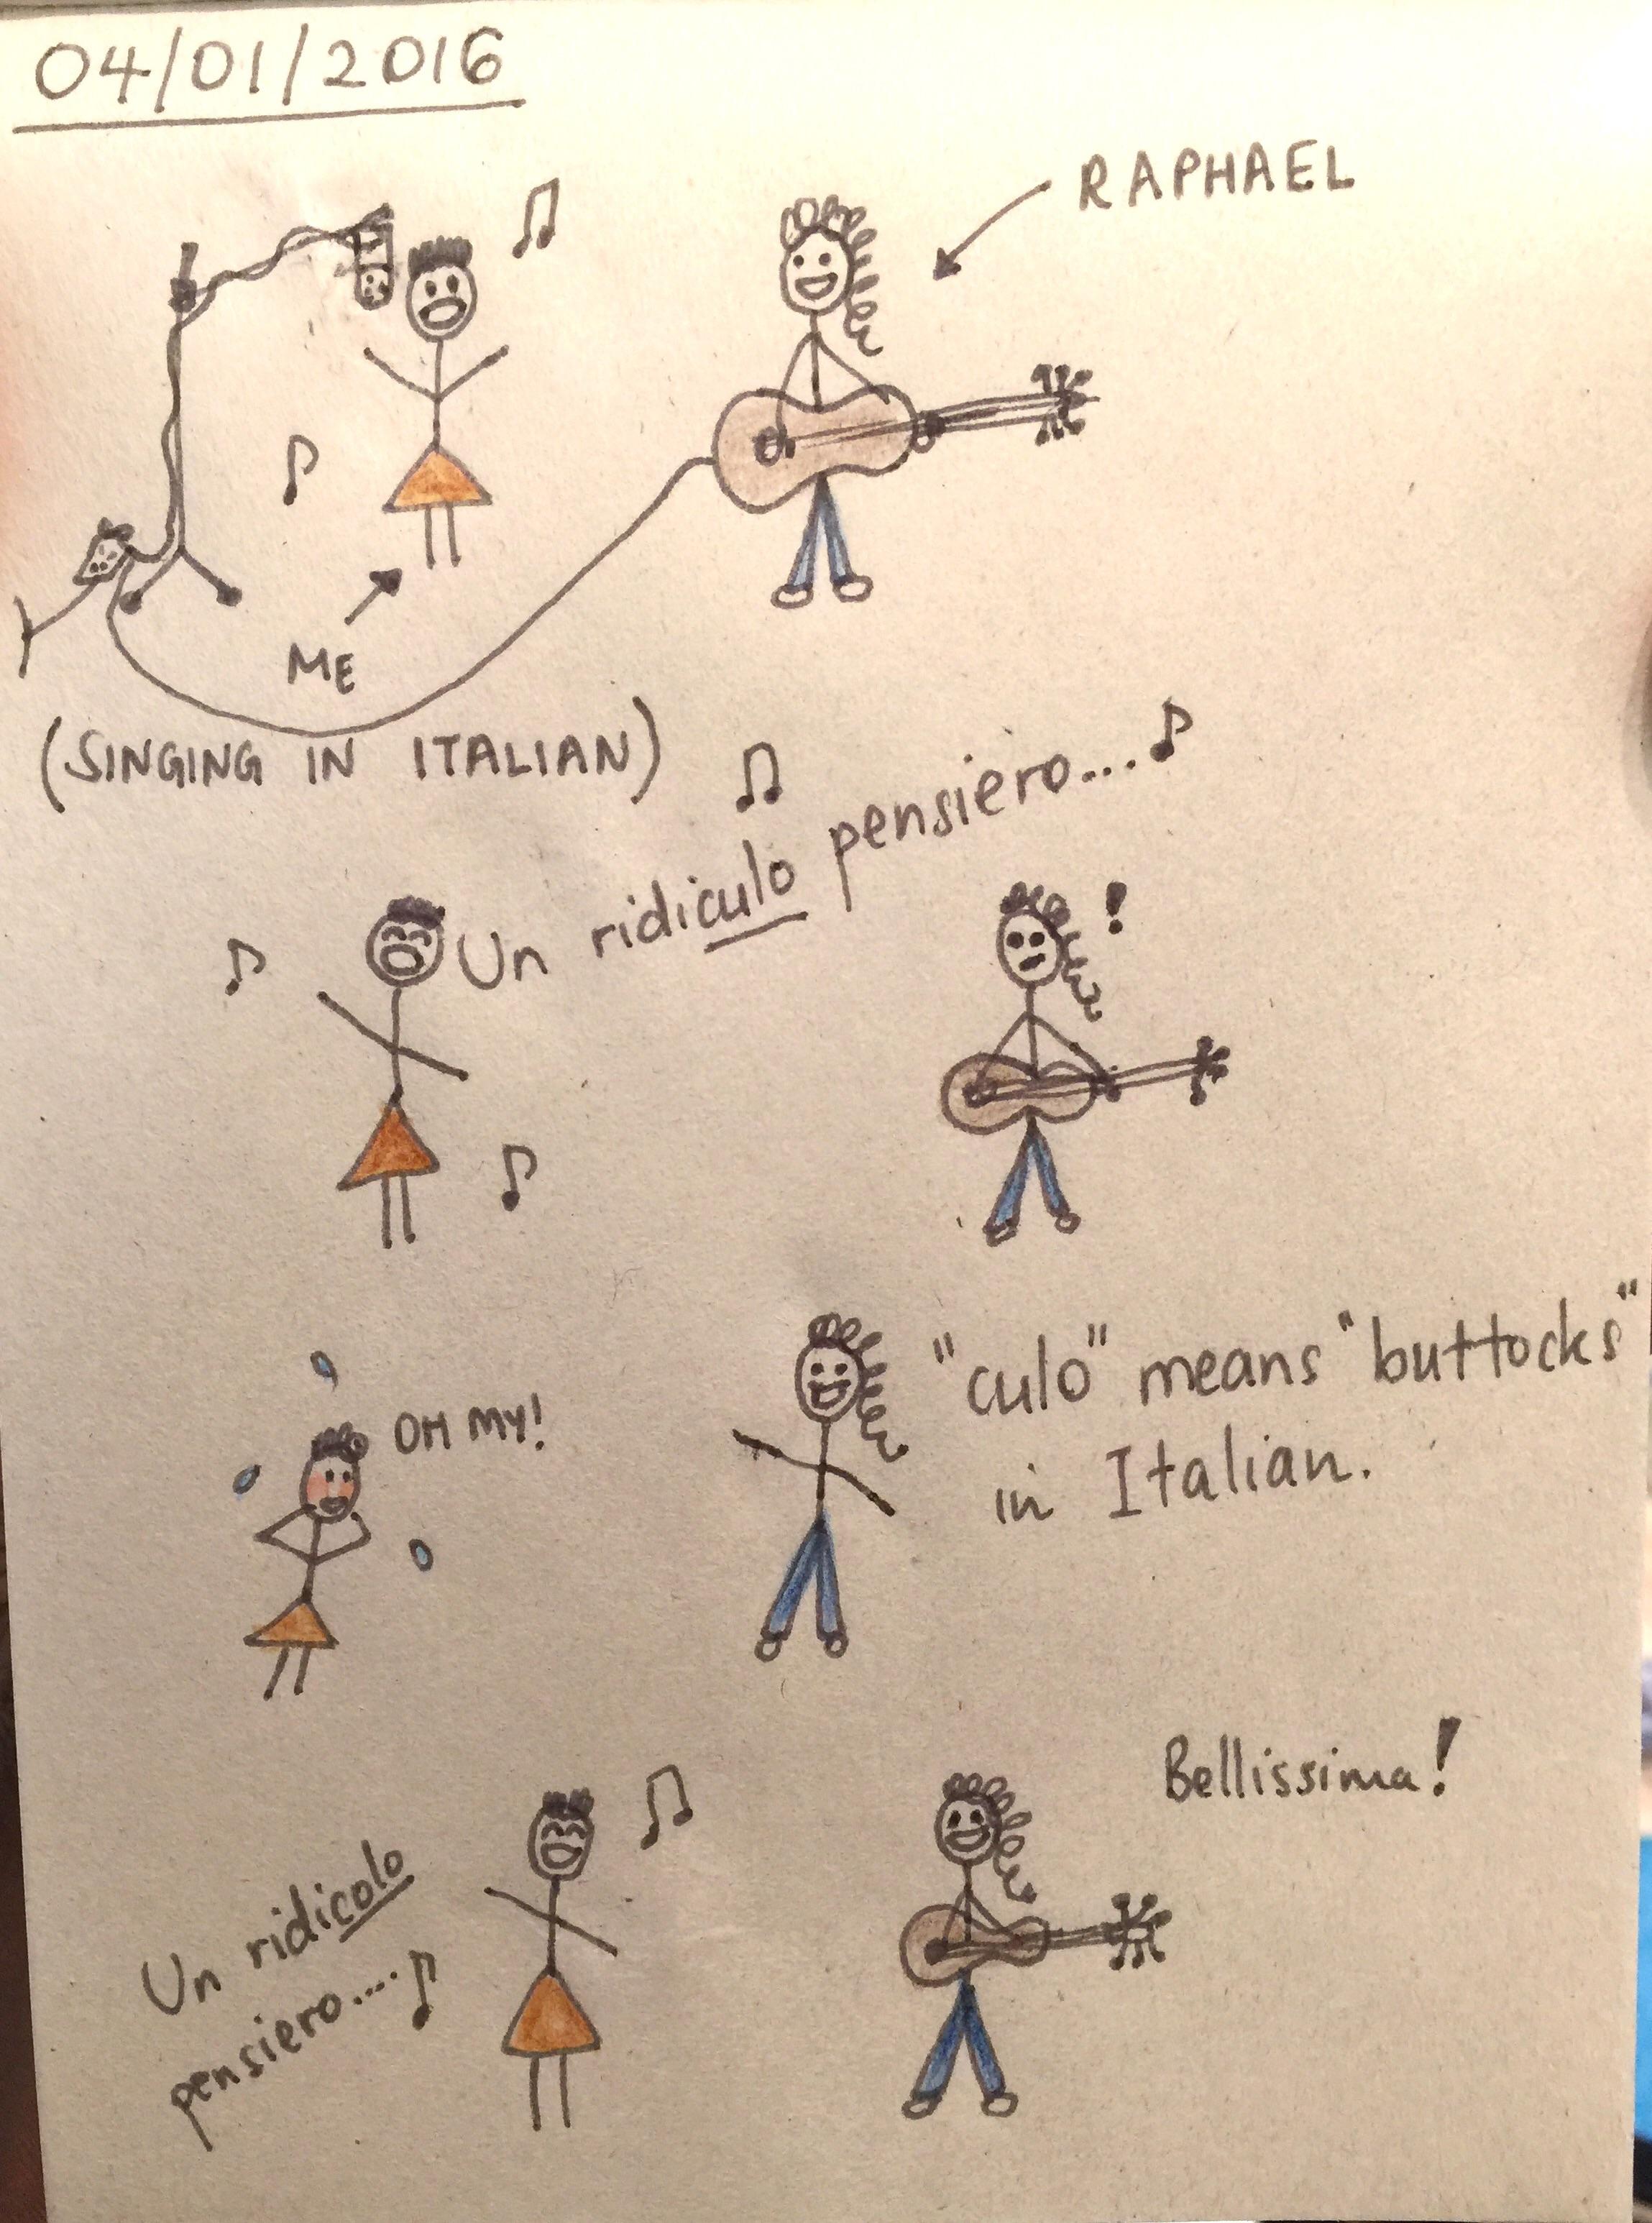 I imagine Italian speakers would have been making fun of me. Hehe